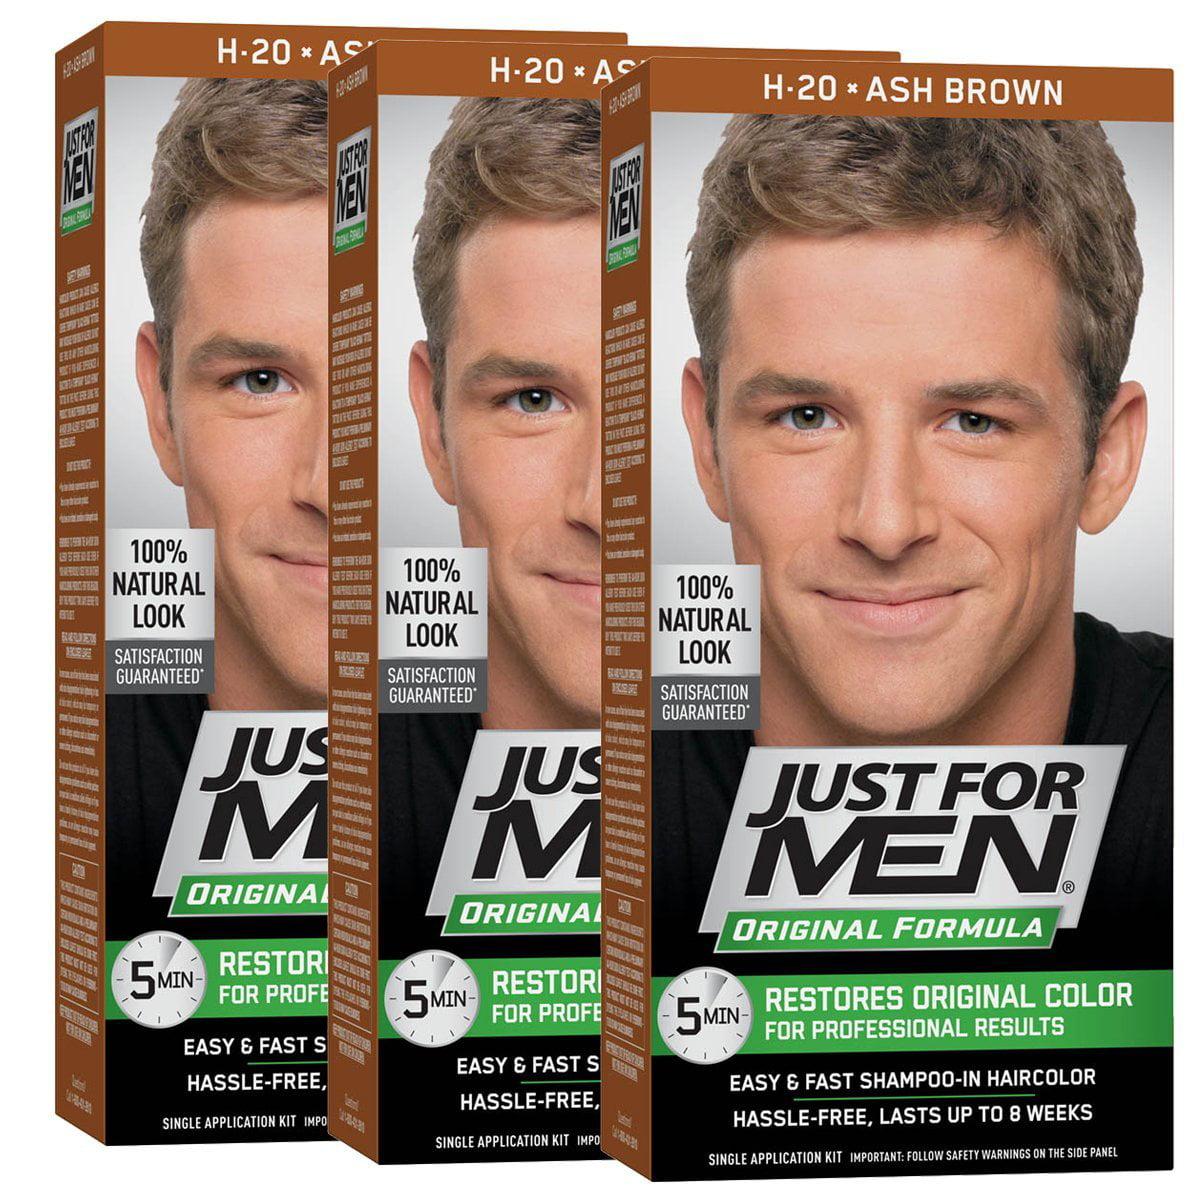 Just For Men Original Formula Men S Hair Color Ash Brown Pack Of 3 Walmart Com Walmart Com